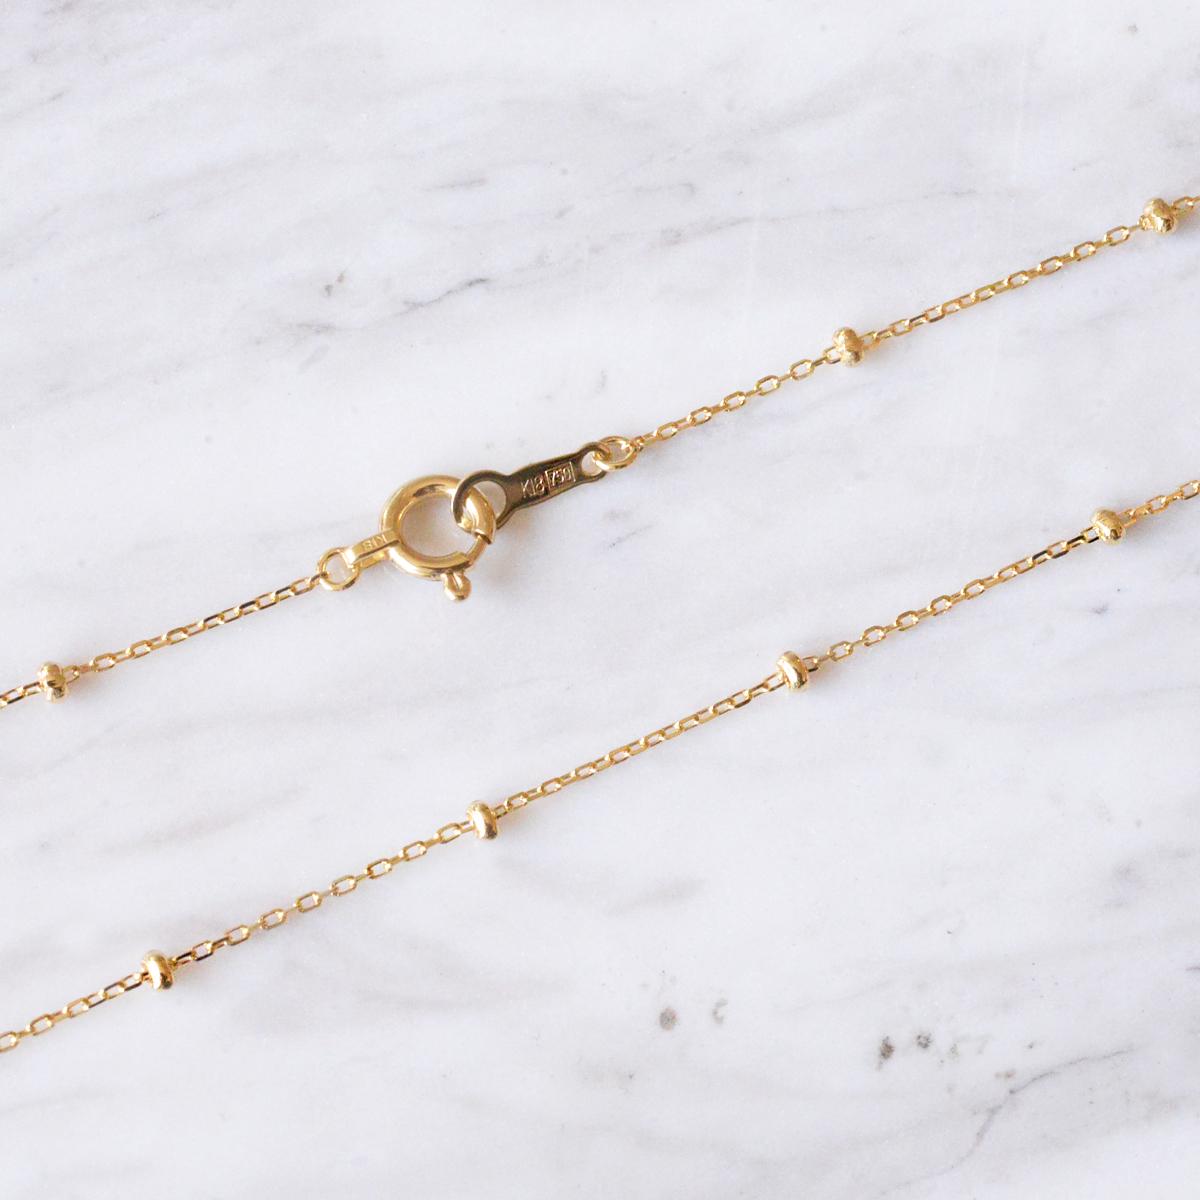 k18ネックレス K18 イエローゴールド スタッド アズキチェーン ビーズ幅1.7mm チェーン 40cm/ プレゼント ギフト gold necklace ach1663c40